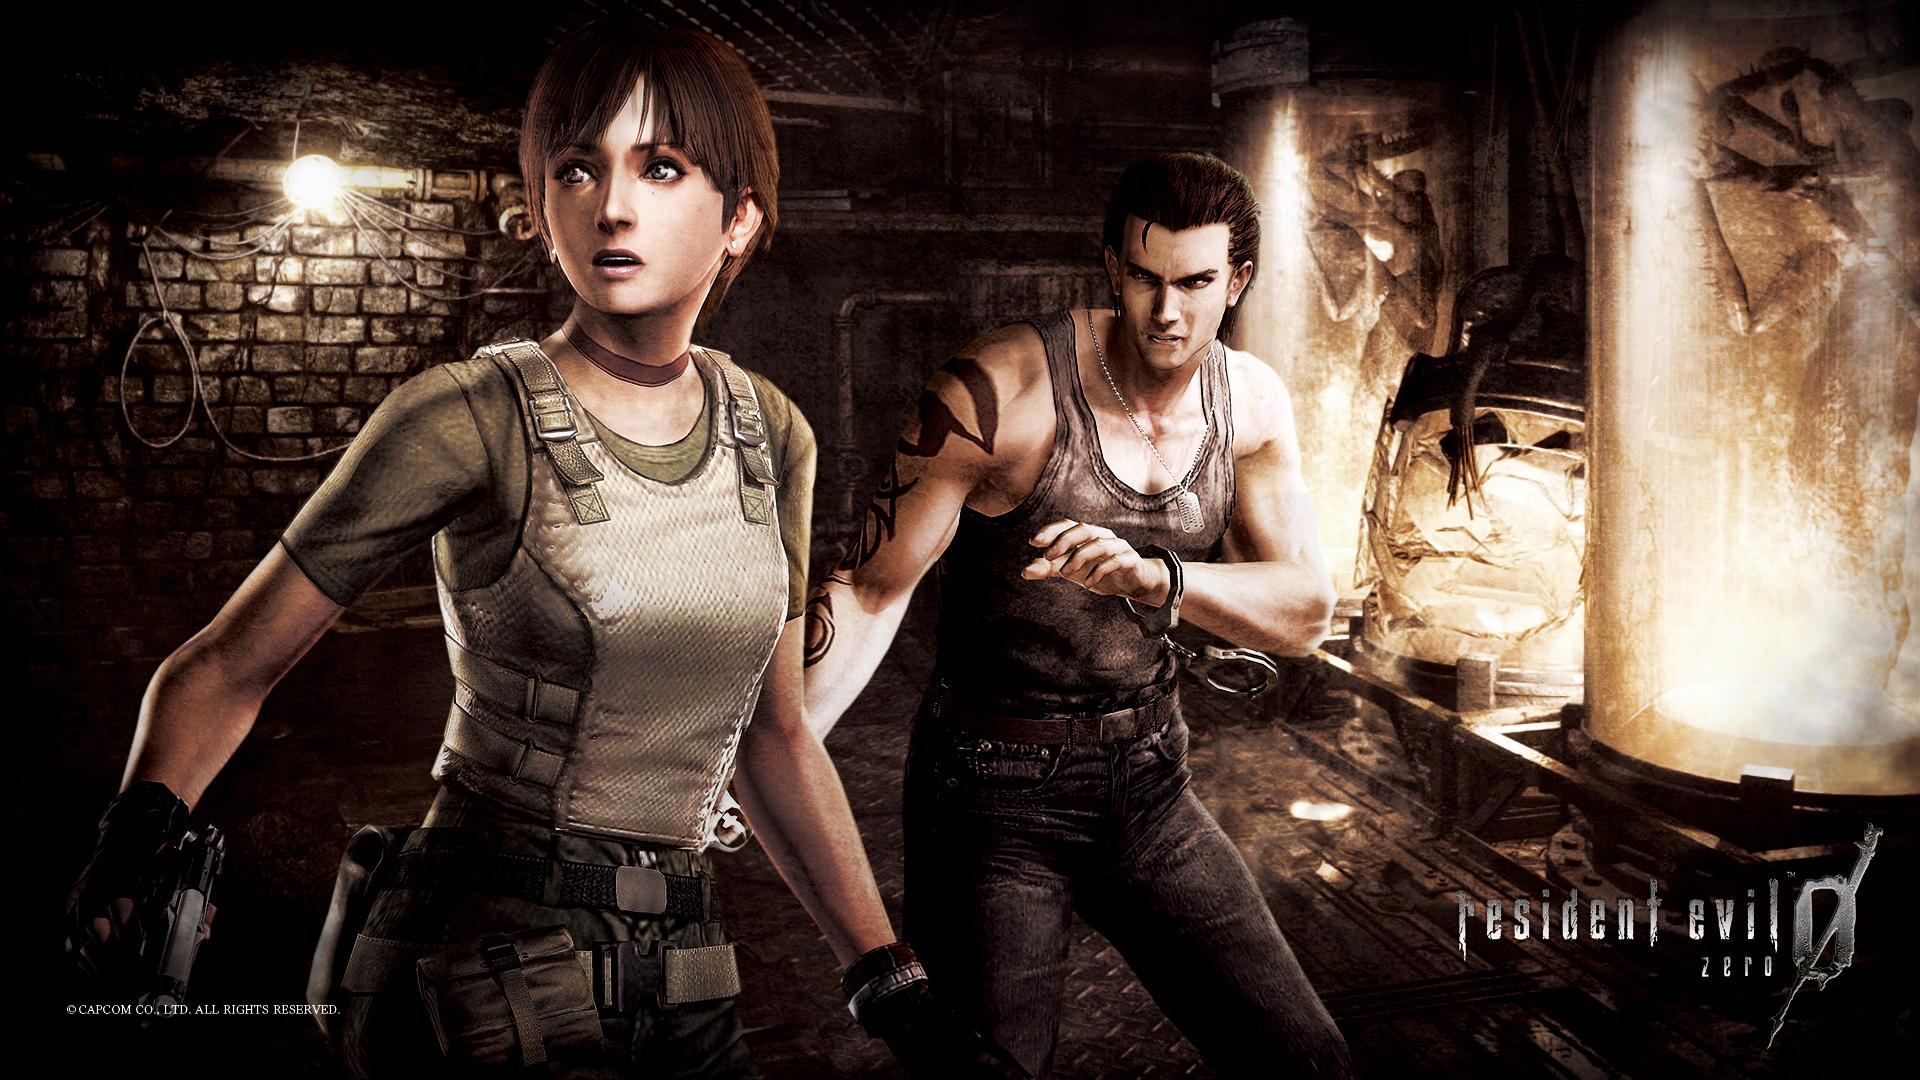 Resident Evil Zero Wallpapers - Wallpaper Cave